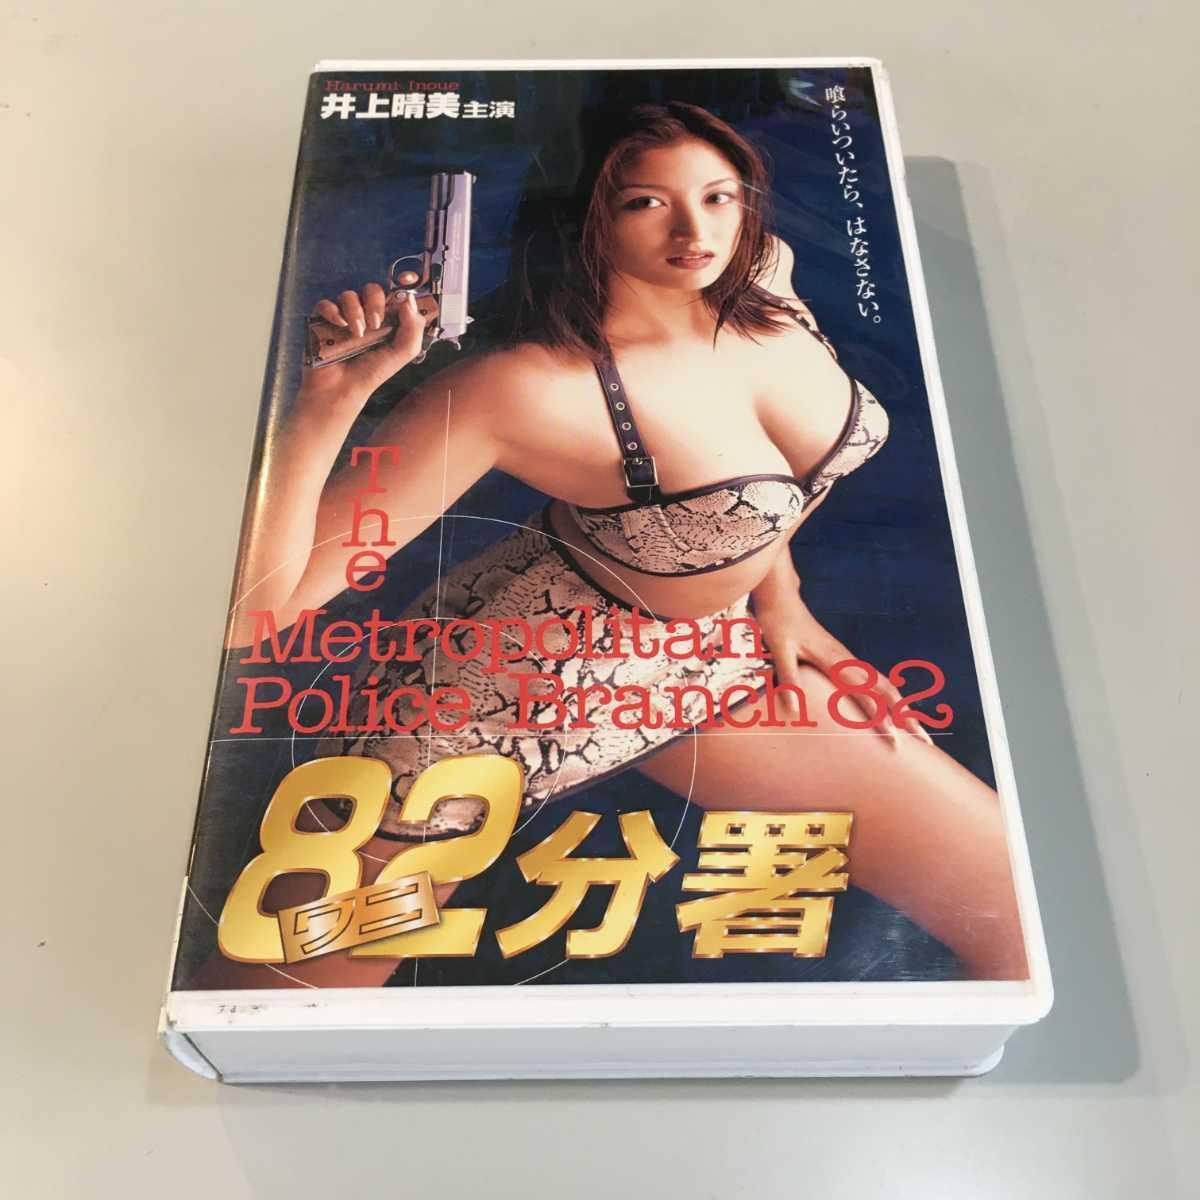 VHS☆82(ワニ)分署/井上晴美 田山真美子 清水宏次朗 ポール牧